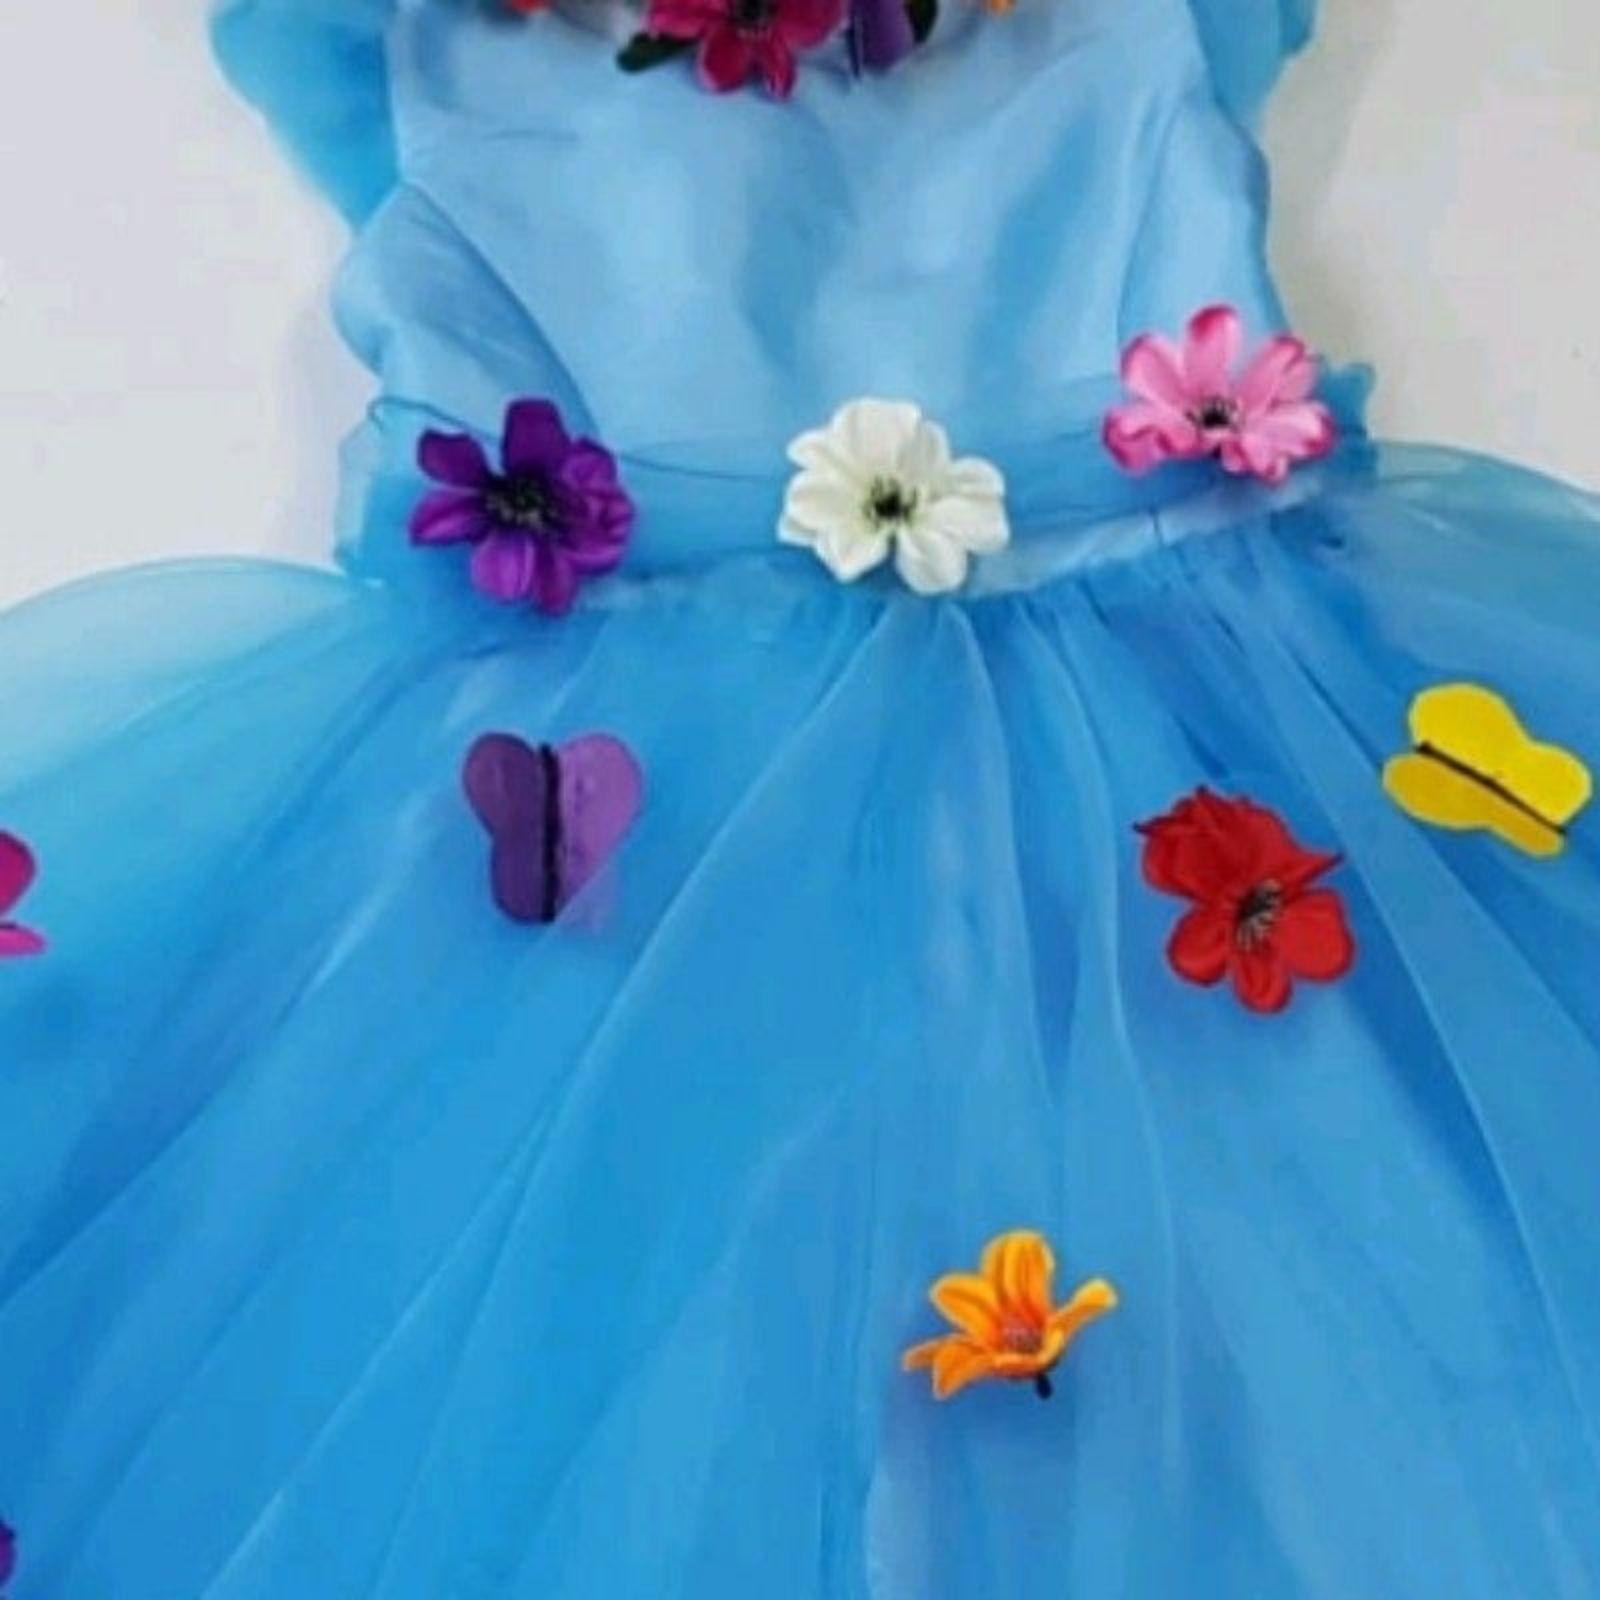 Prințesa bleu cu flori și fluturași 3